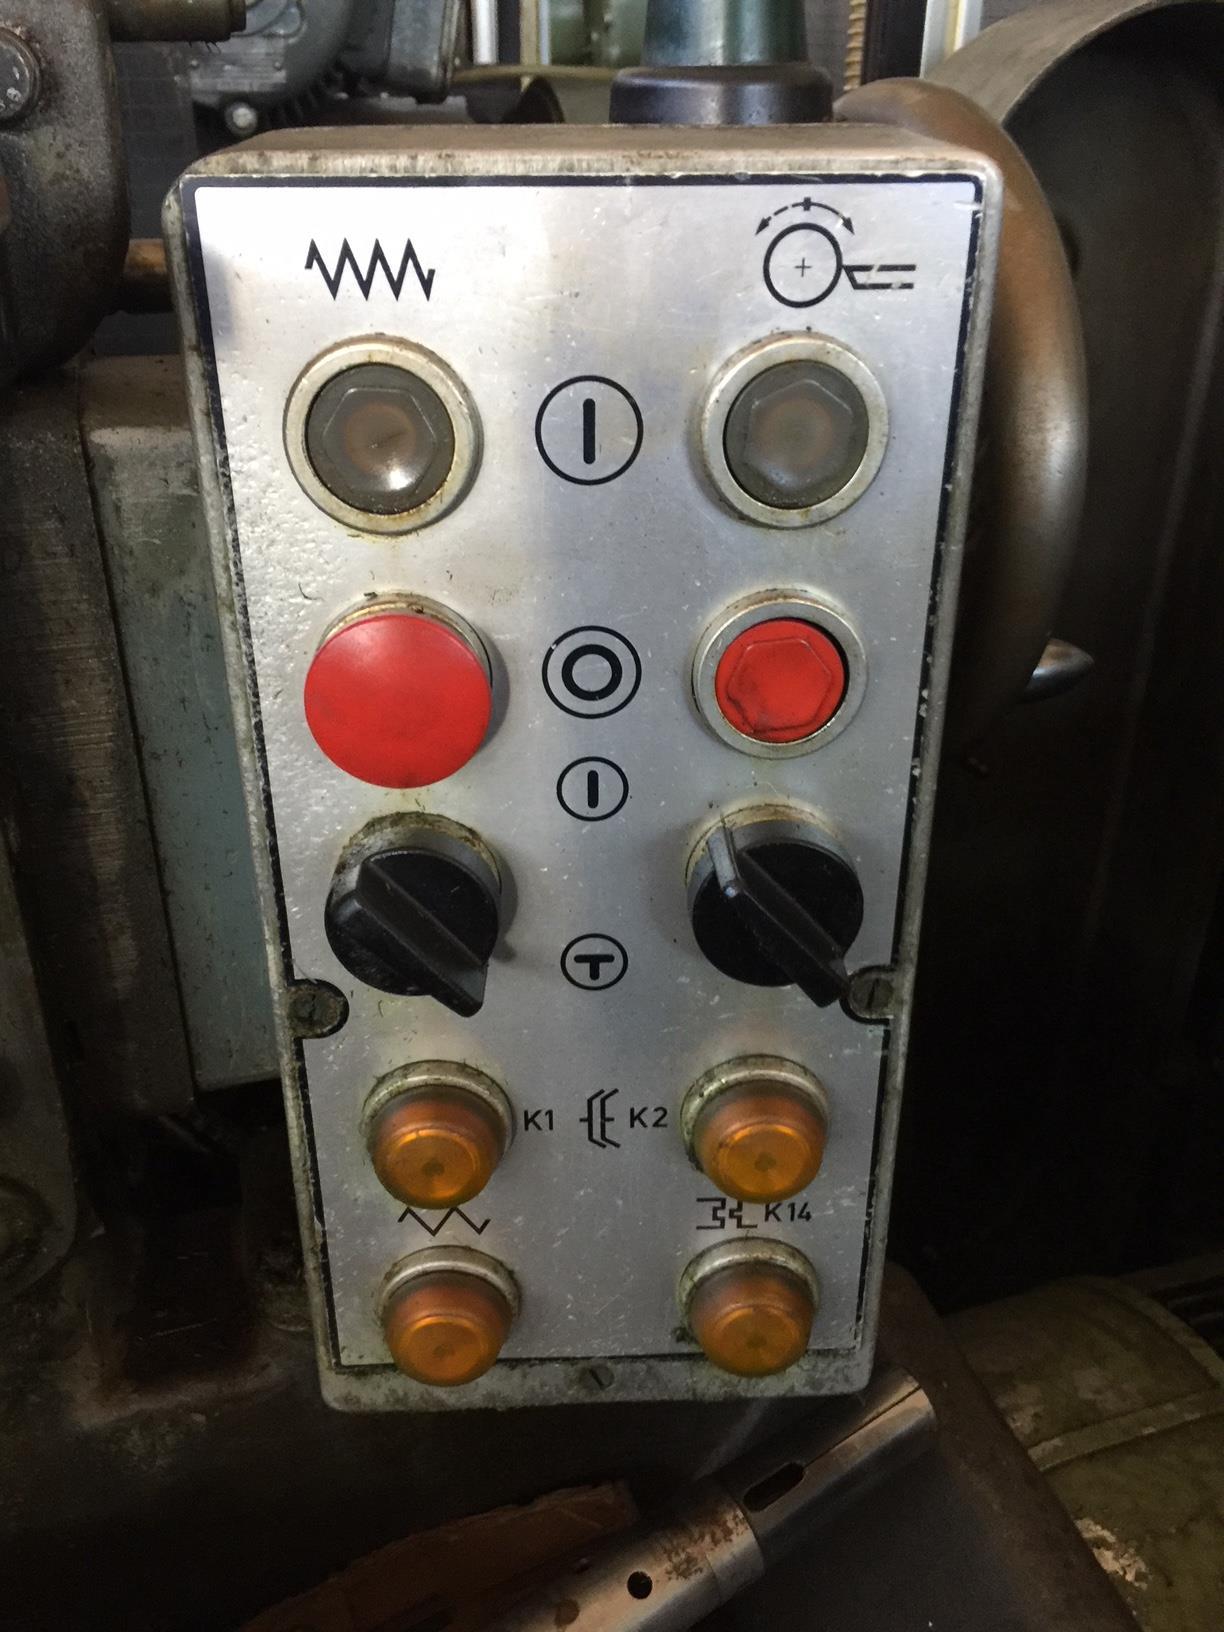 Lot 45 - Index Model C 29, Single Spindle Automatic Lathe